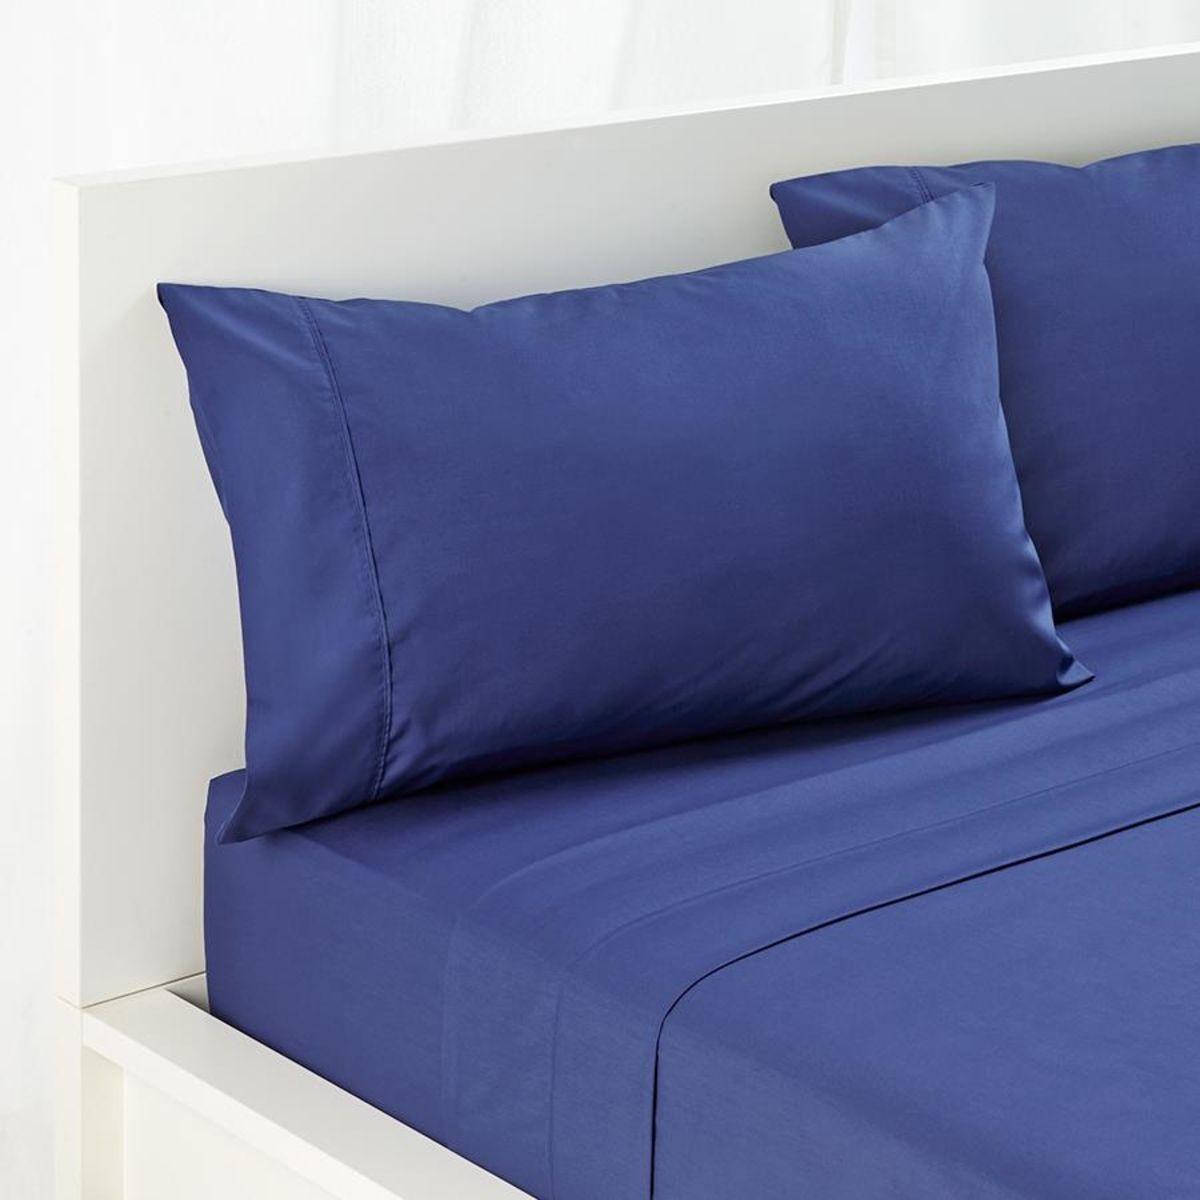 180 Thread Count Sheet Set   King Single Bed, Mid Blue | Kmart  #DoubleBedSheets